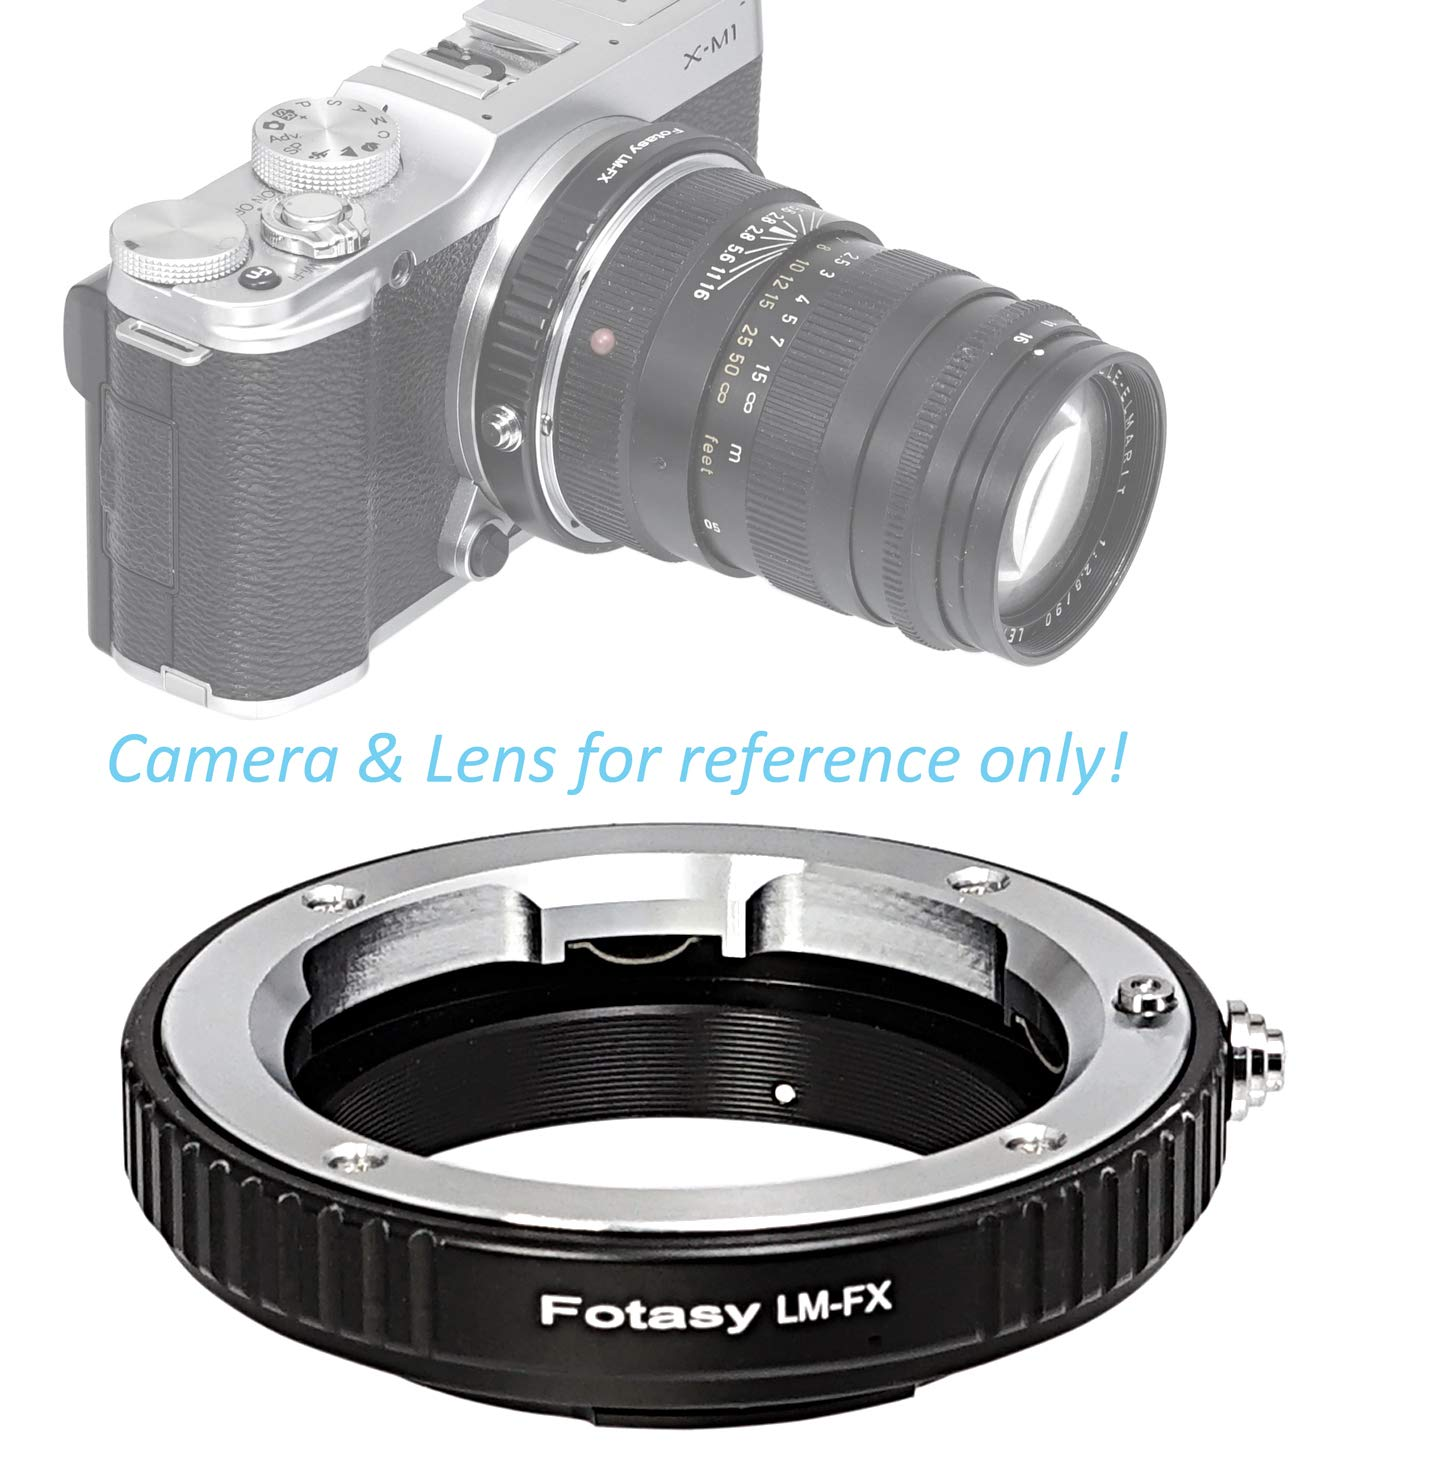 Adaptor for X-E1 Pro Leica M to Fuji X Mount Lens Adapter X-E2 etc X-Pro1